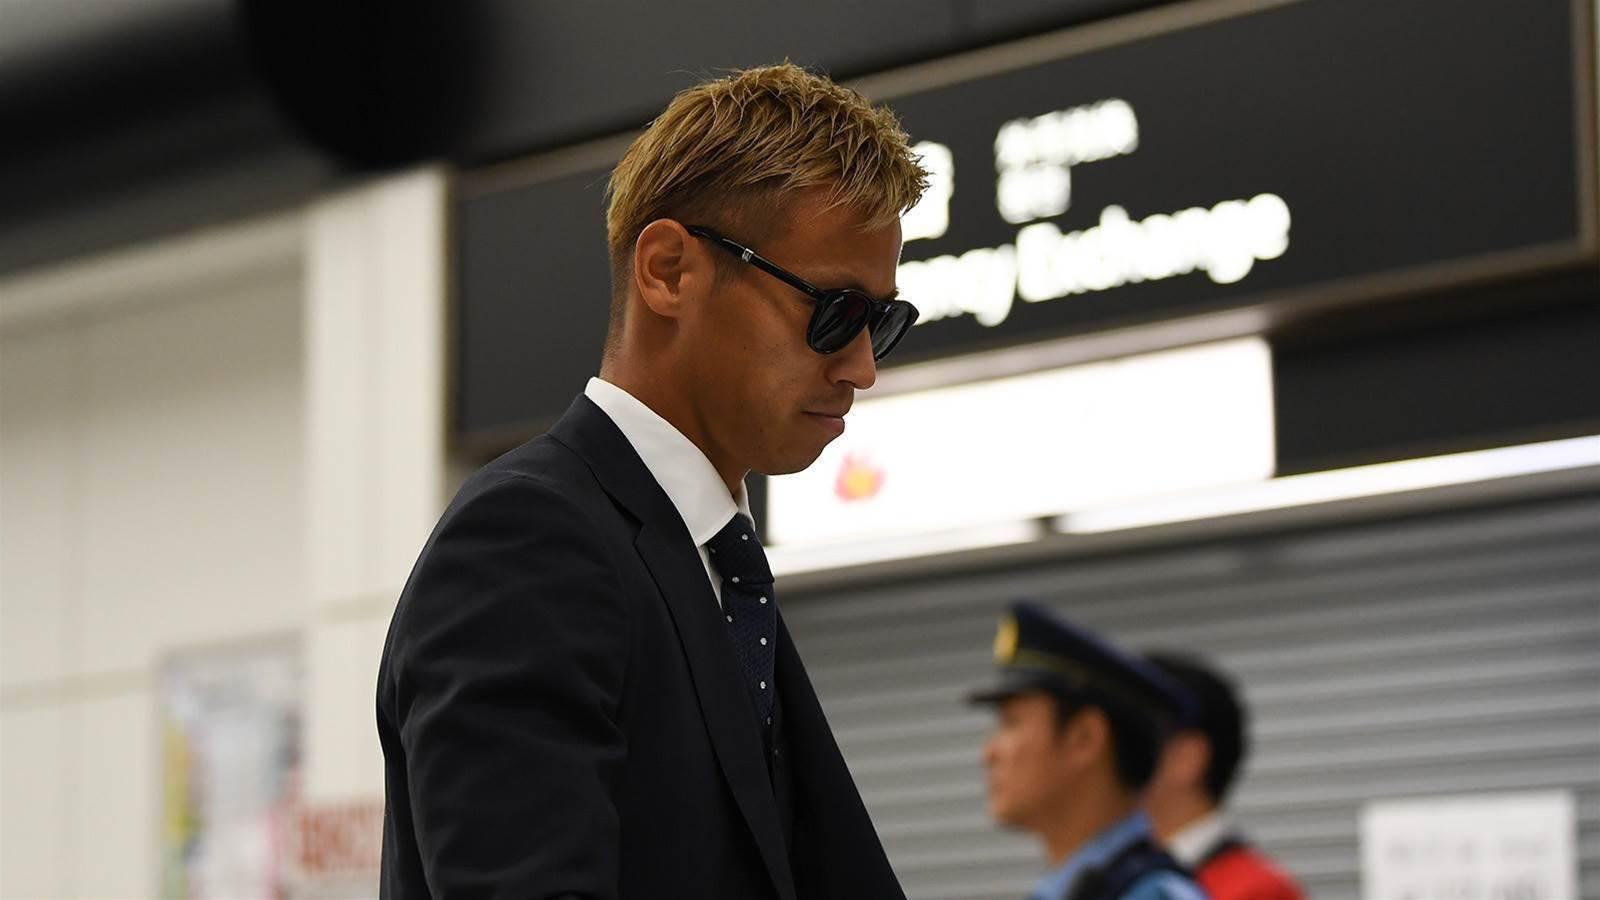 Keisuke Honda's set to sign for Melbourne Victory tomorrow...